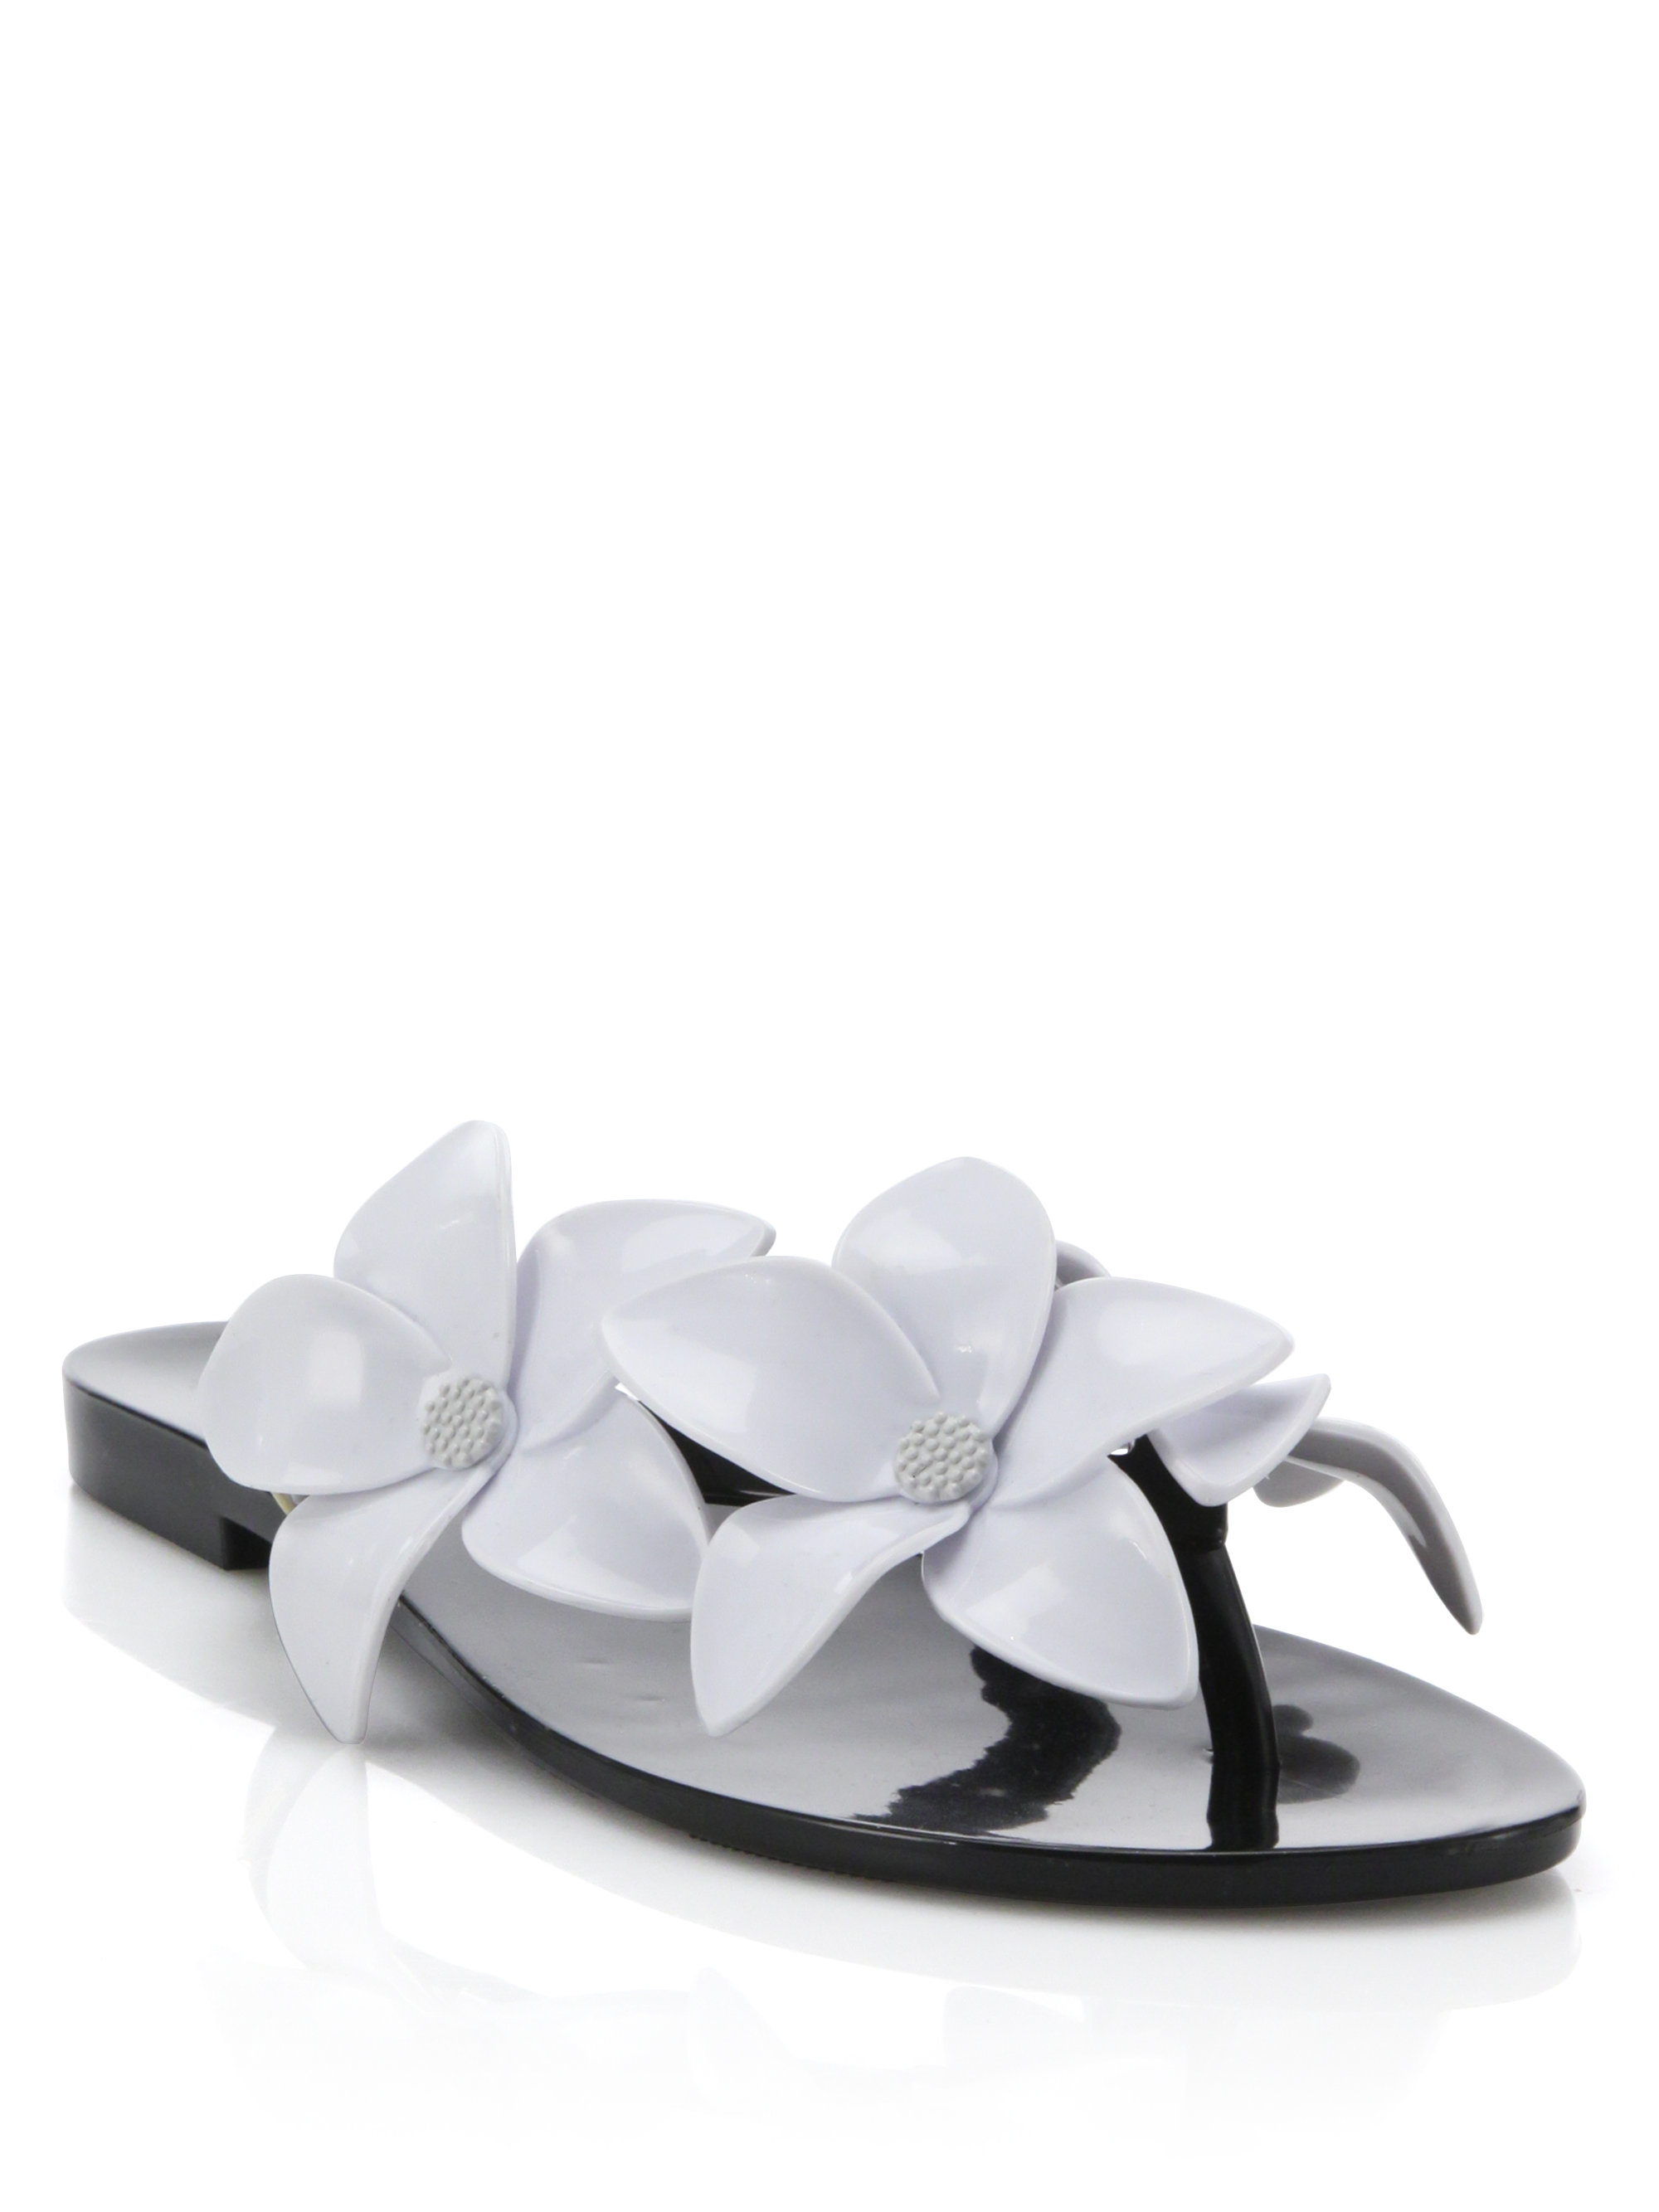 9e2dec2b1bd42 Lyst - Melissa Harmonic Flower PVC Flip-Flops in Black